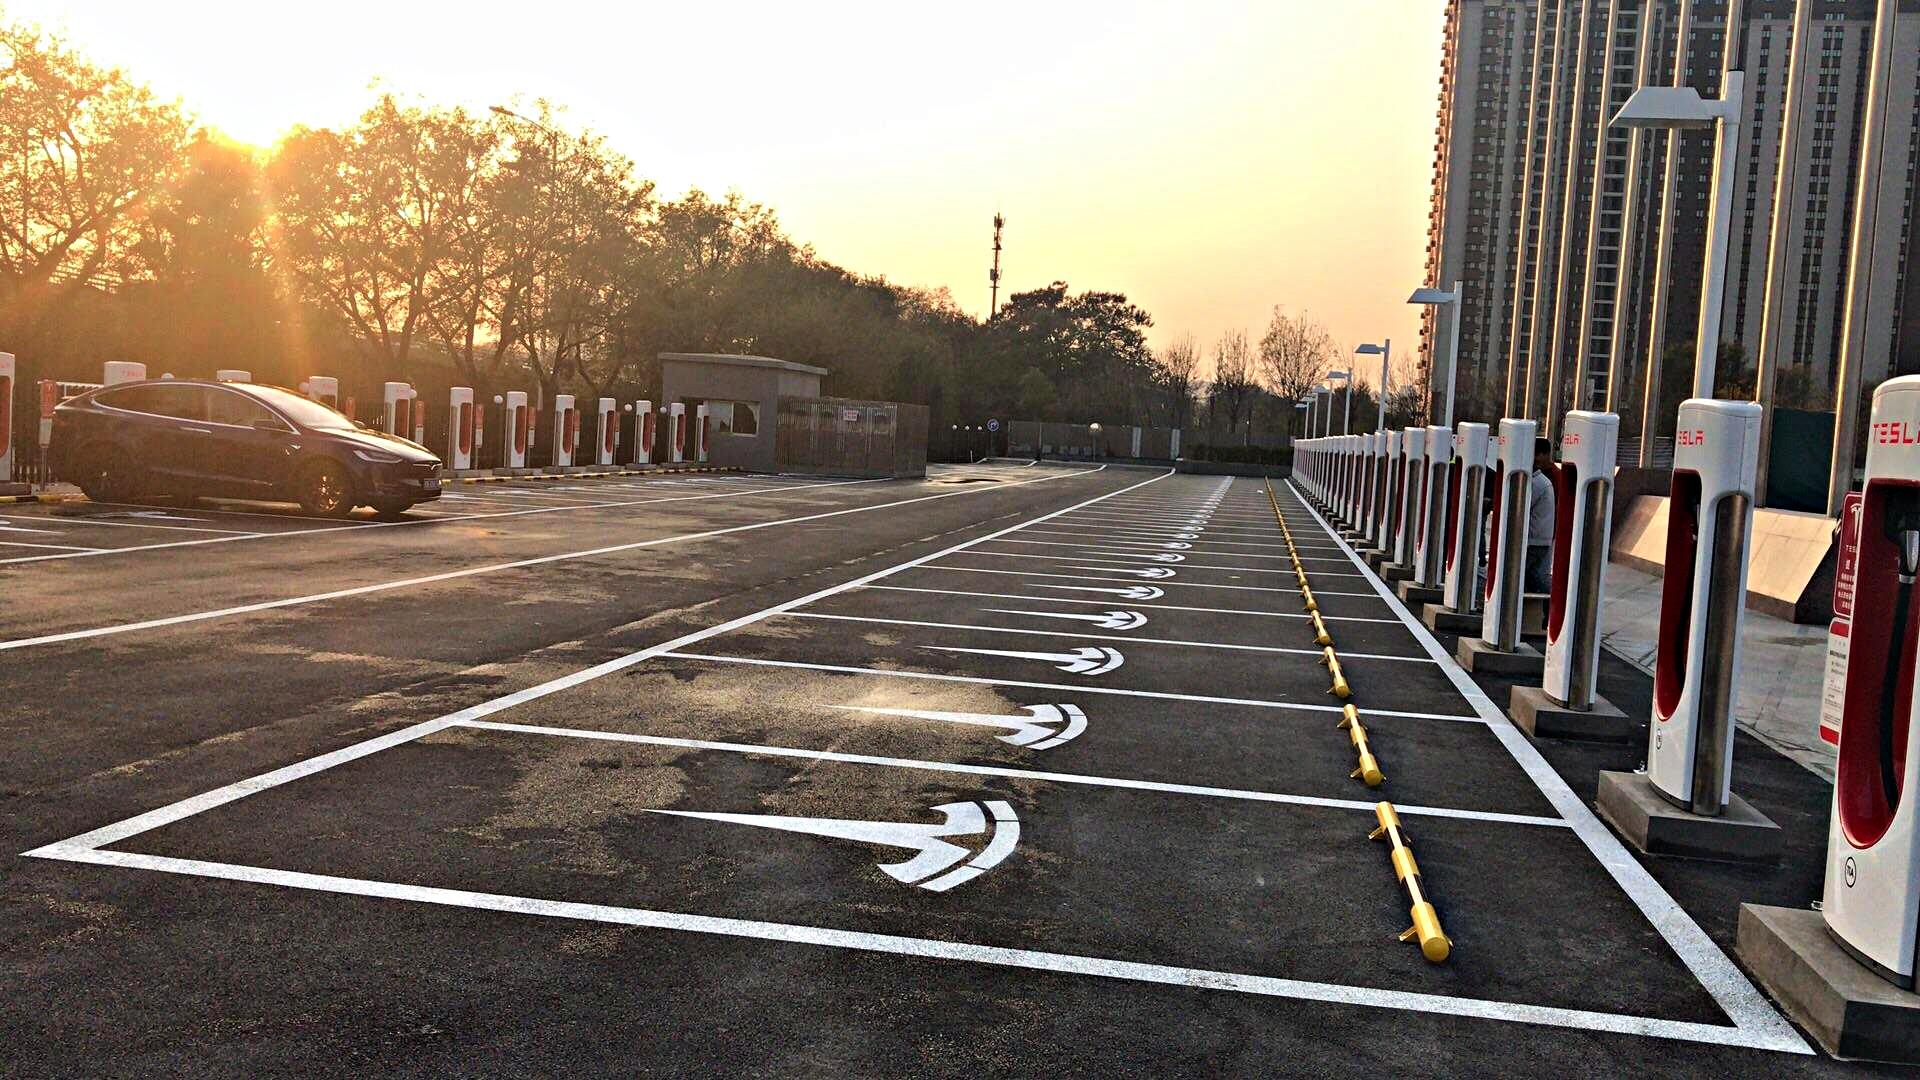 tesla-baolong-mansion-supercharger-beijing-china-50-stalls